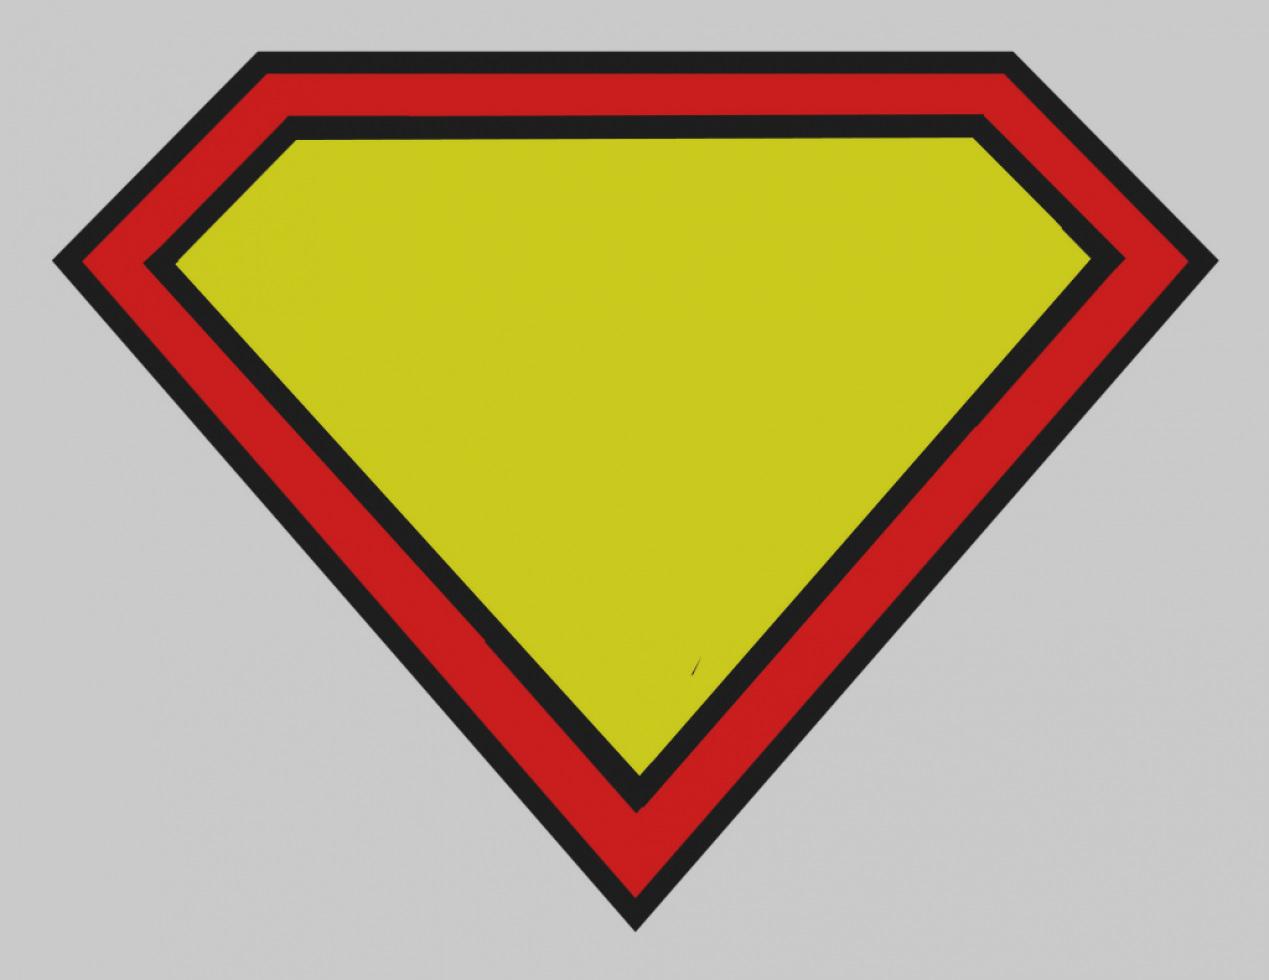 1269x980 Unique Of Blank Superman Logo Template Free Download Clip Art